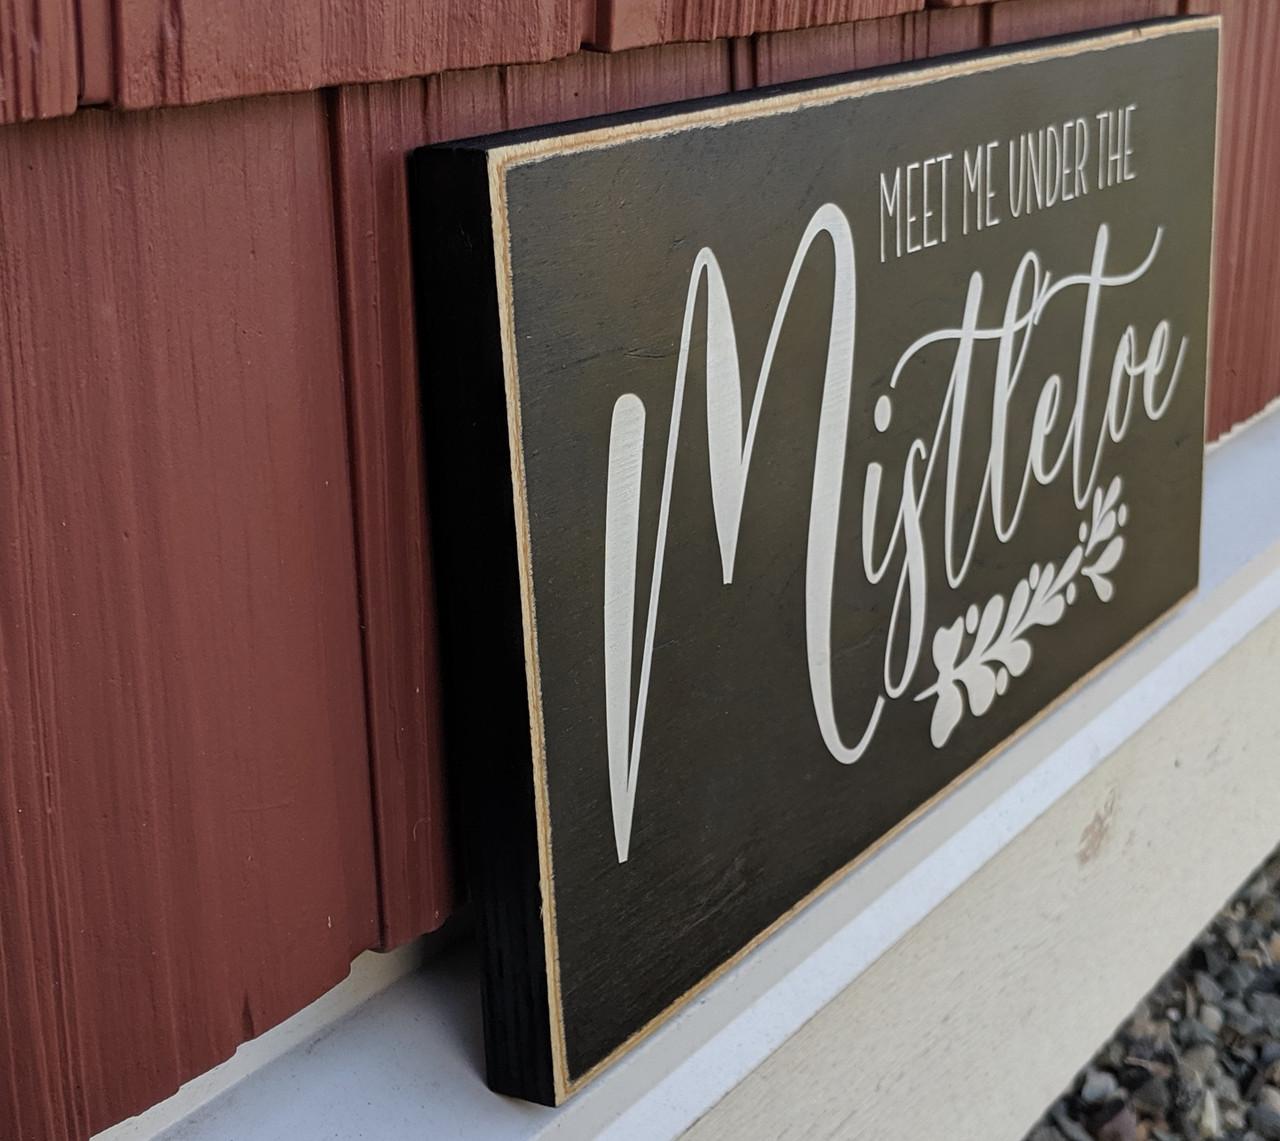 Meet me under the mistletoe sign side view